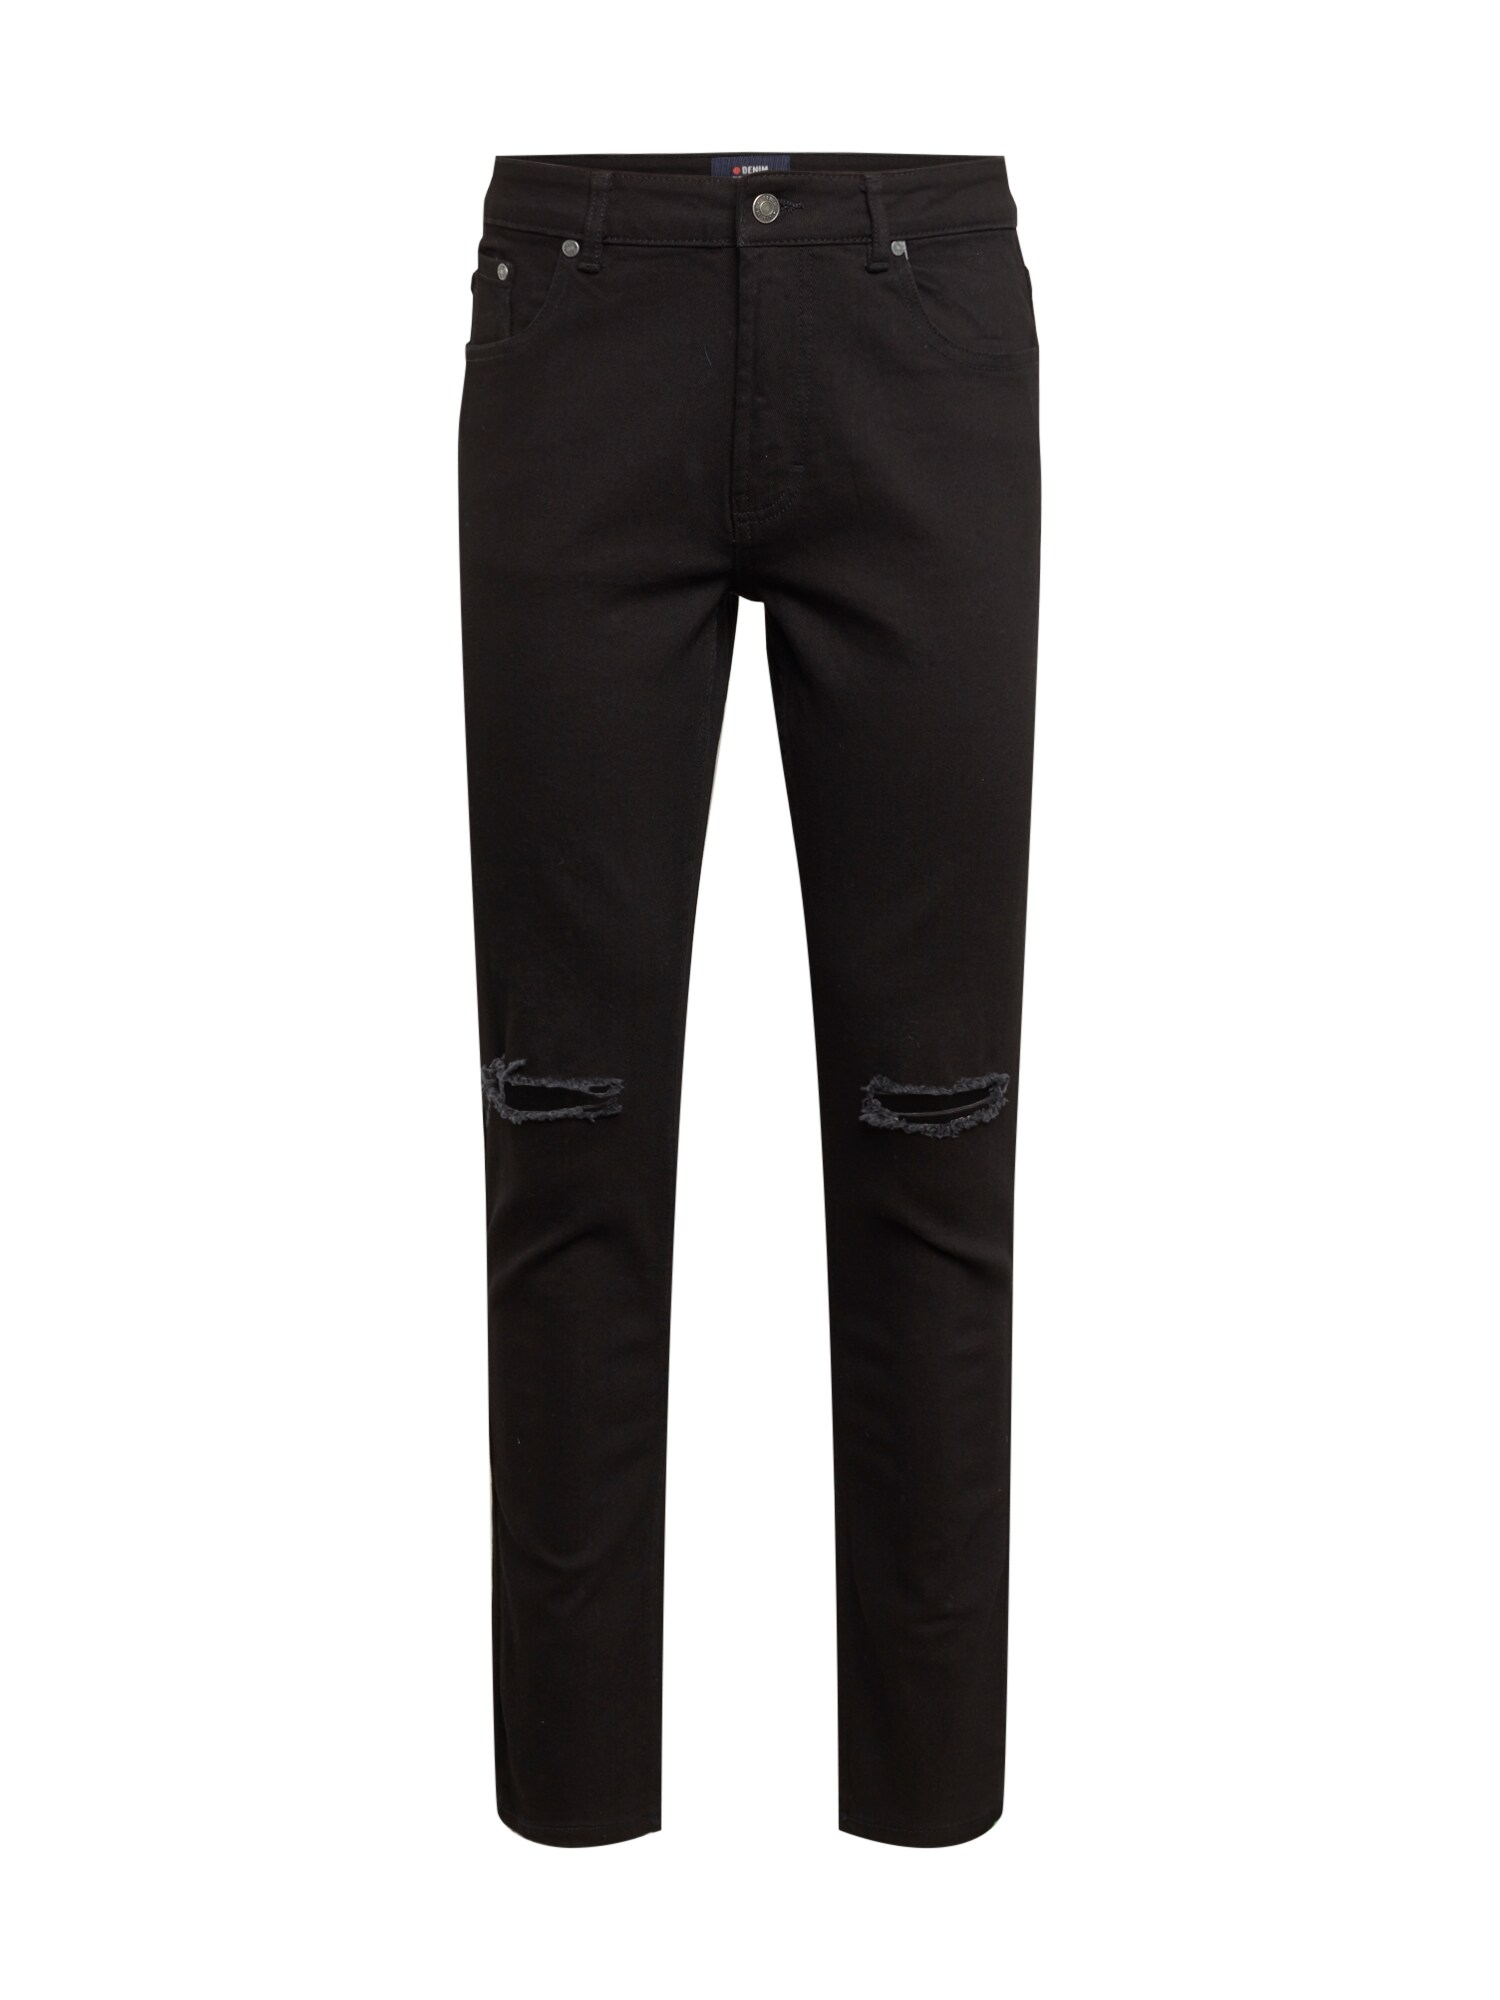 Denim Project Džinsai 'Mr Red Knee Cut' juodo džinso spalva